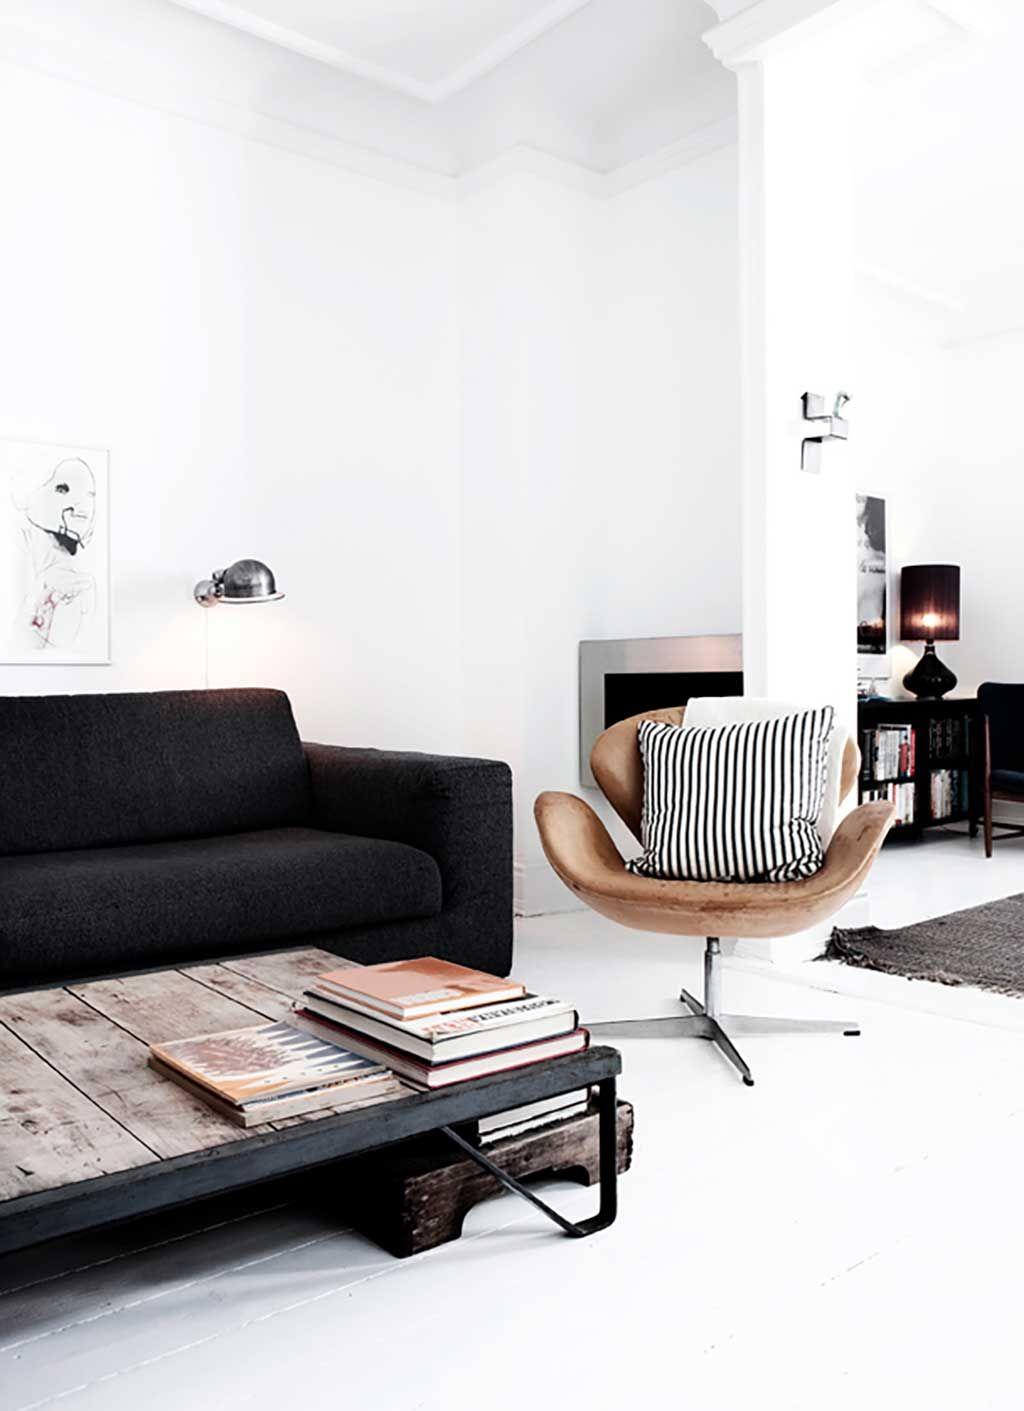 Arne jacobsen interior pin by lakó dominik on home  pinterest